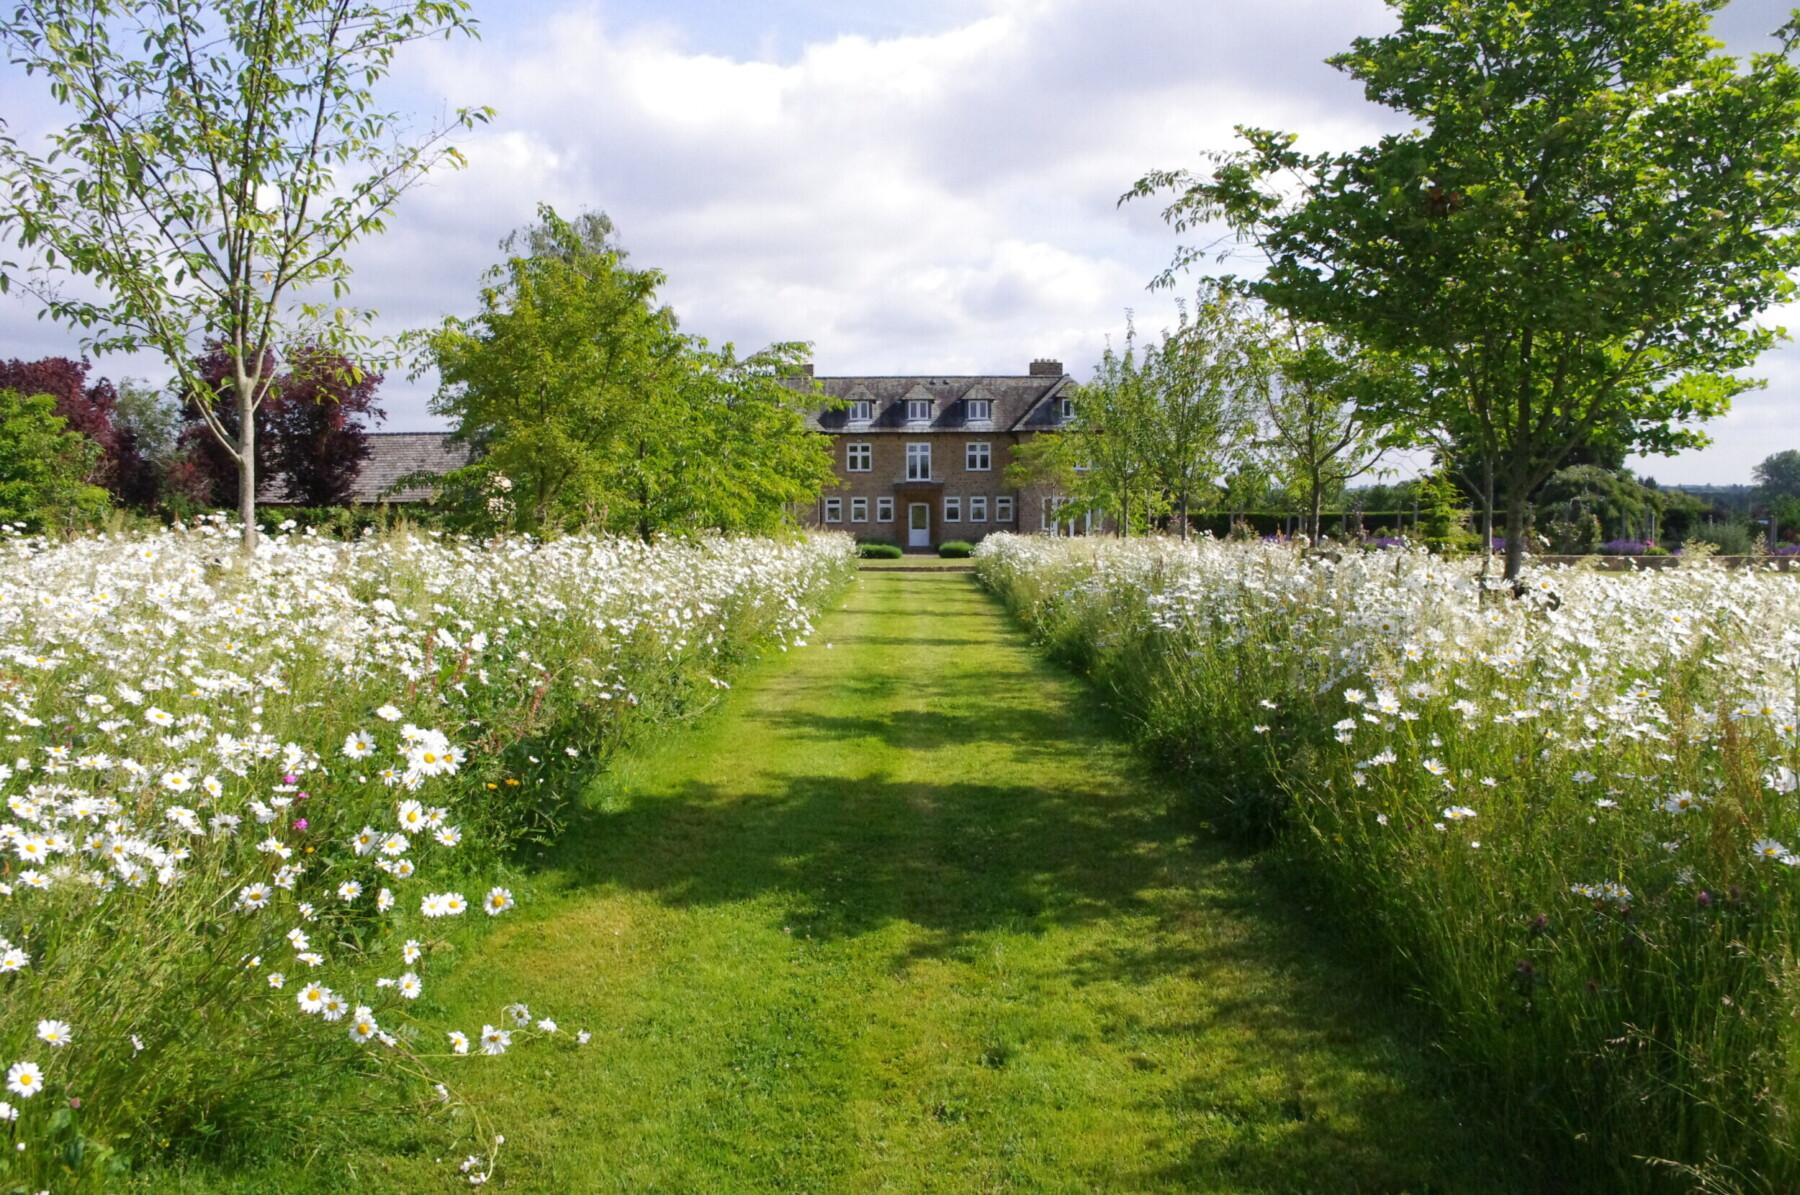 The Secret Garden - Nicholsons Plants, Forestry & Landscapes